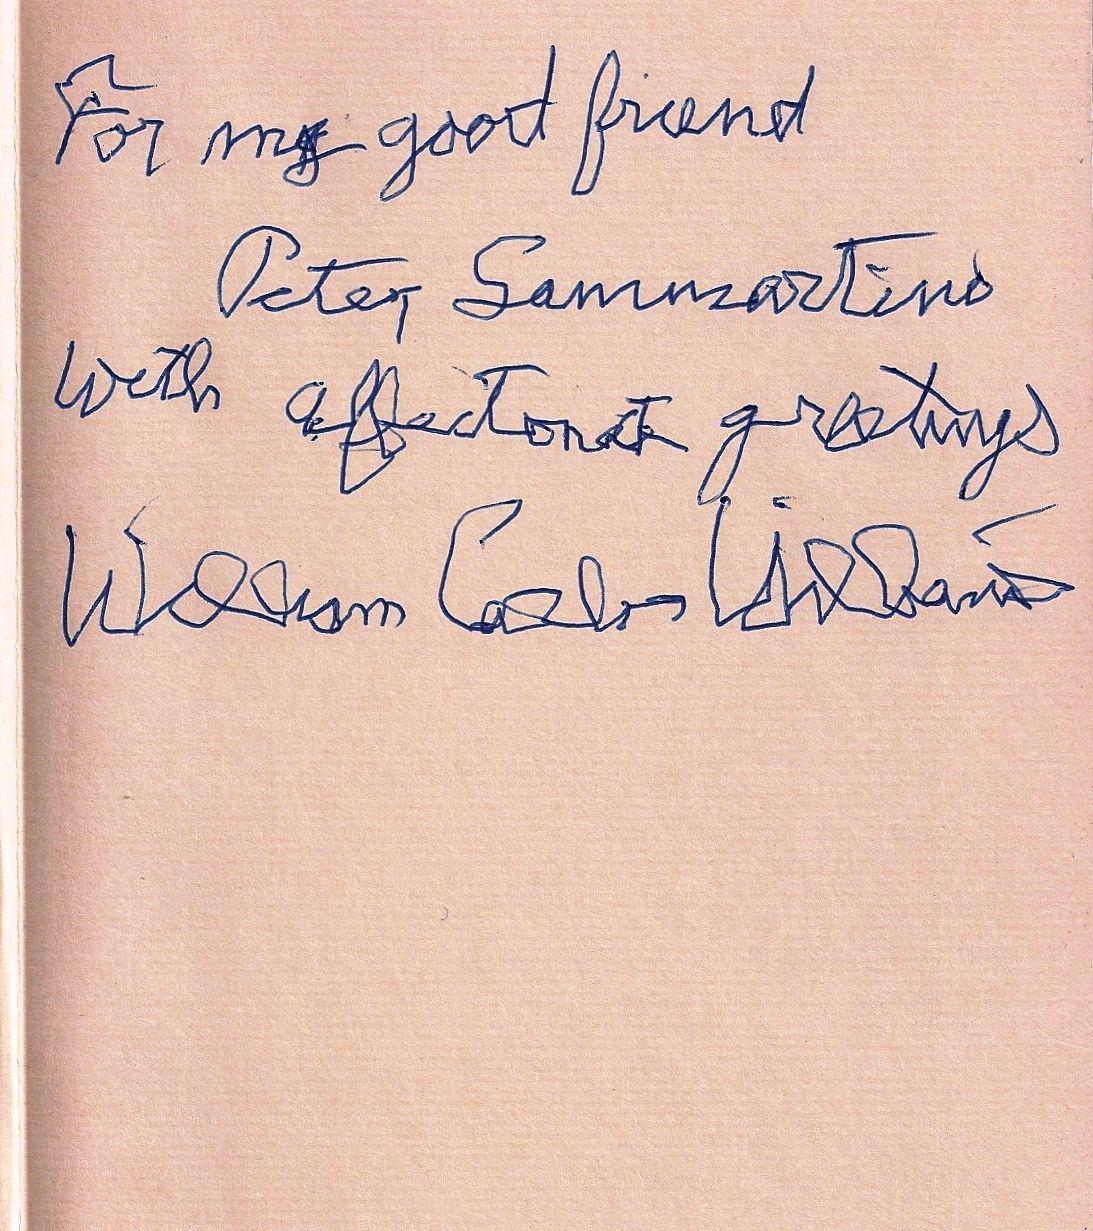 william carlos williams selected poems pdf